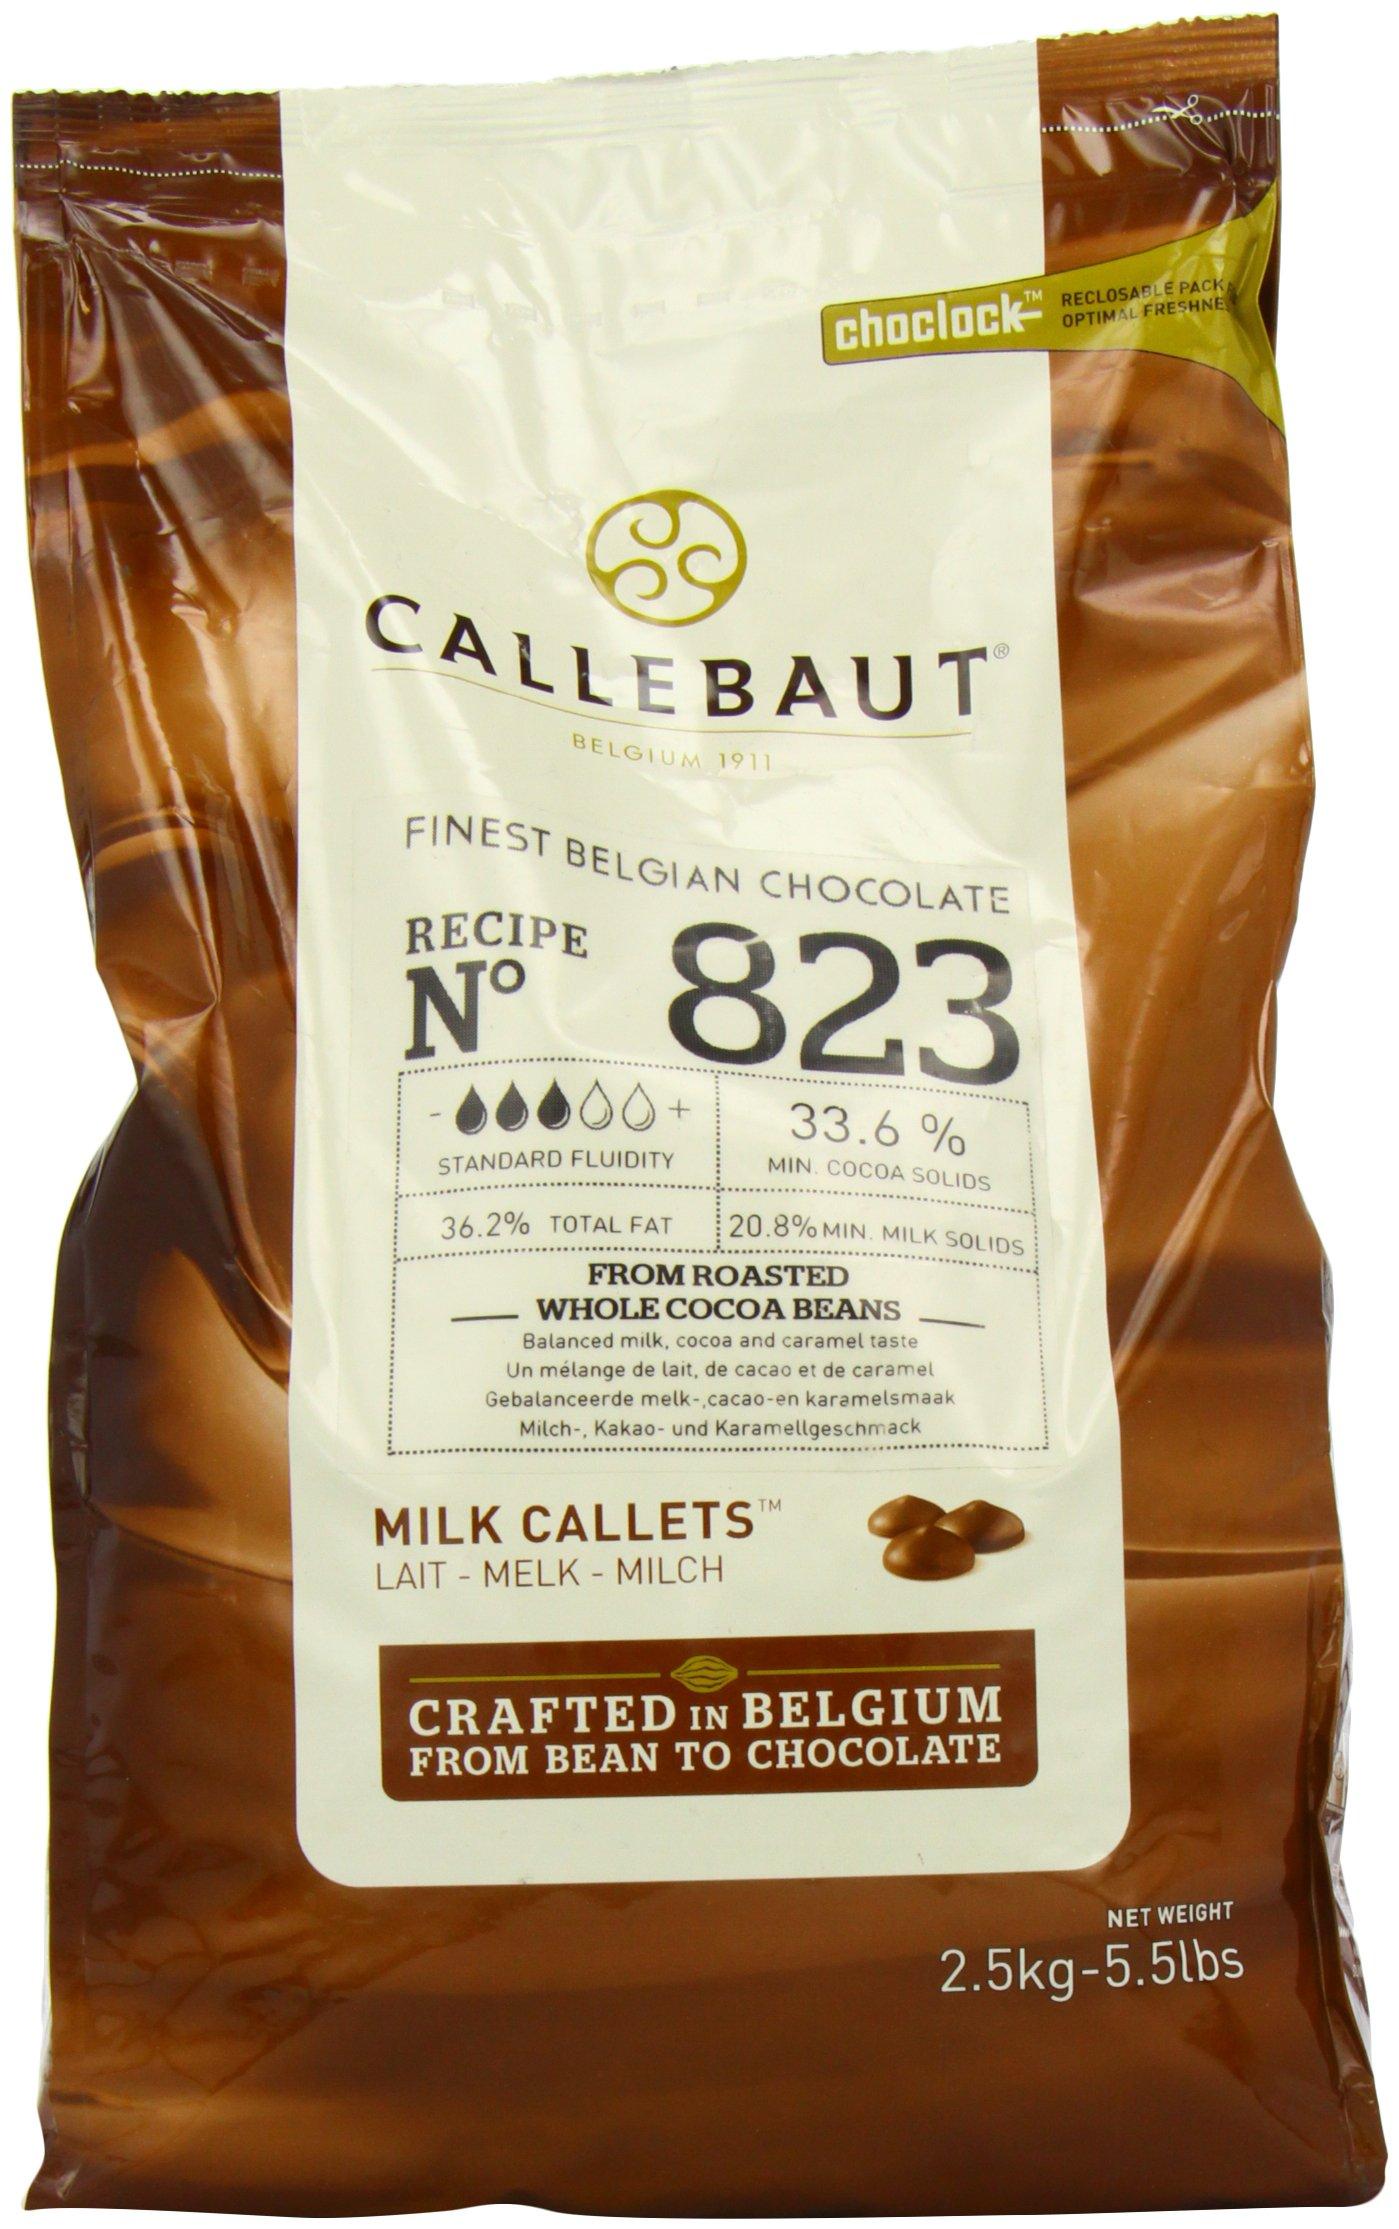 Belgian Milk Chocolate Baking Callets (Chips) - 33.6% - 1 bag, 5.5 lbs